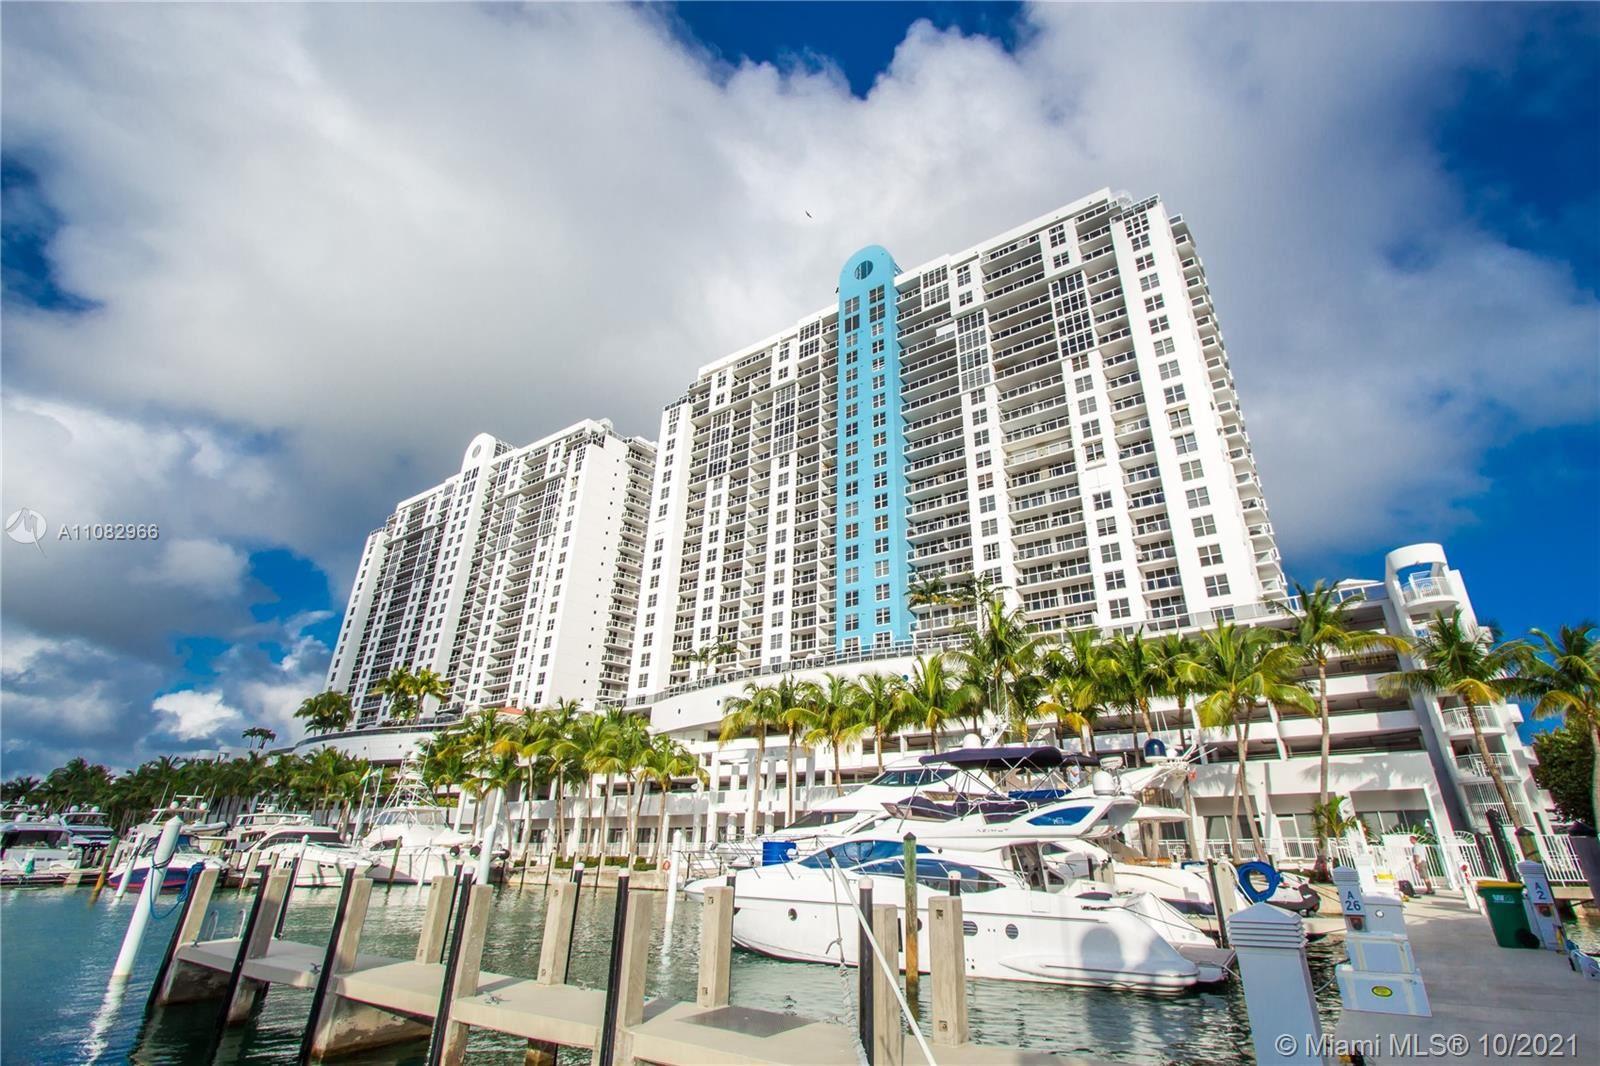 1800 Sunset Harbour #2210, Miami Beach, FL 33139 - #: A11082966